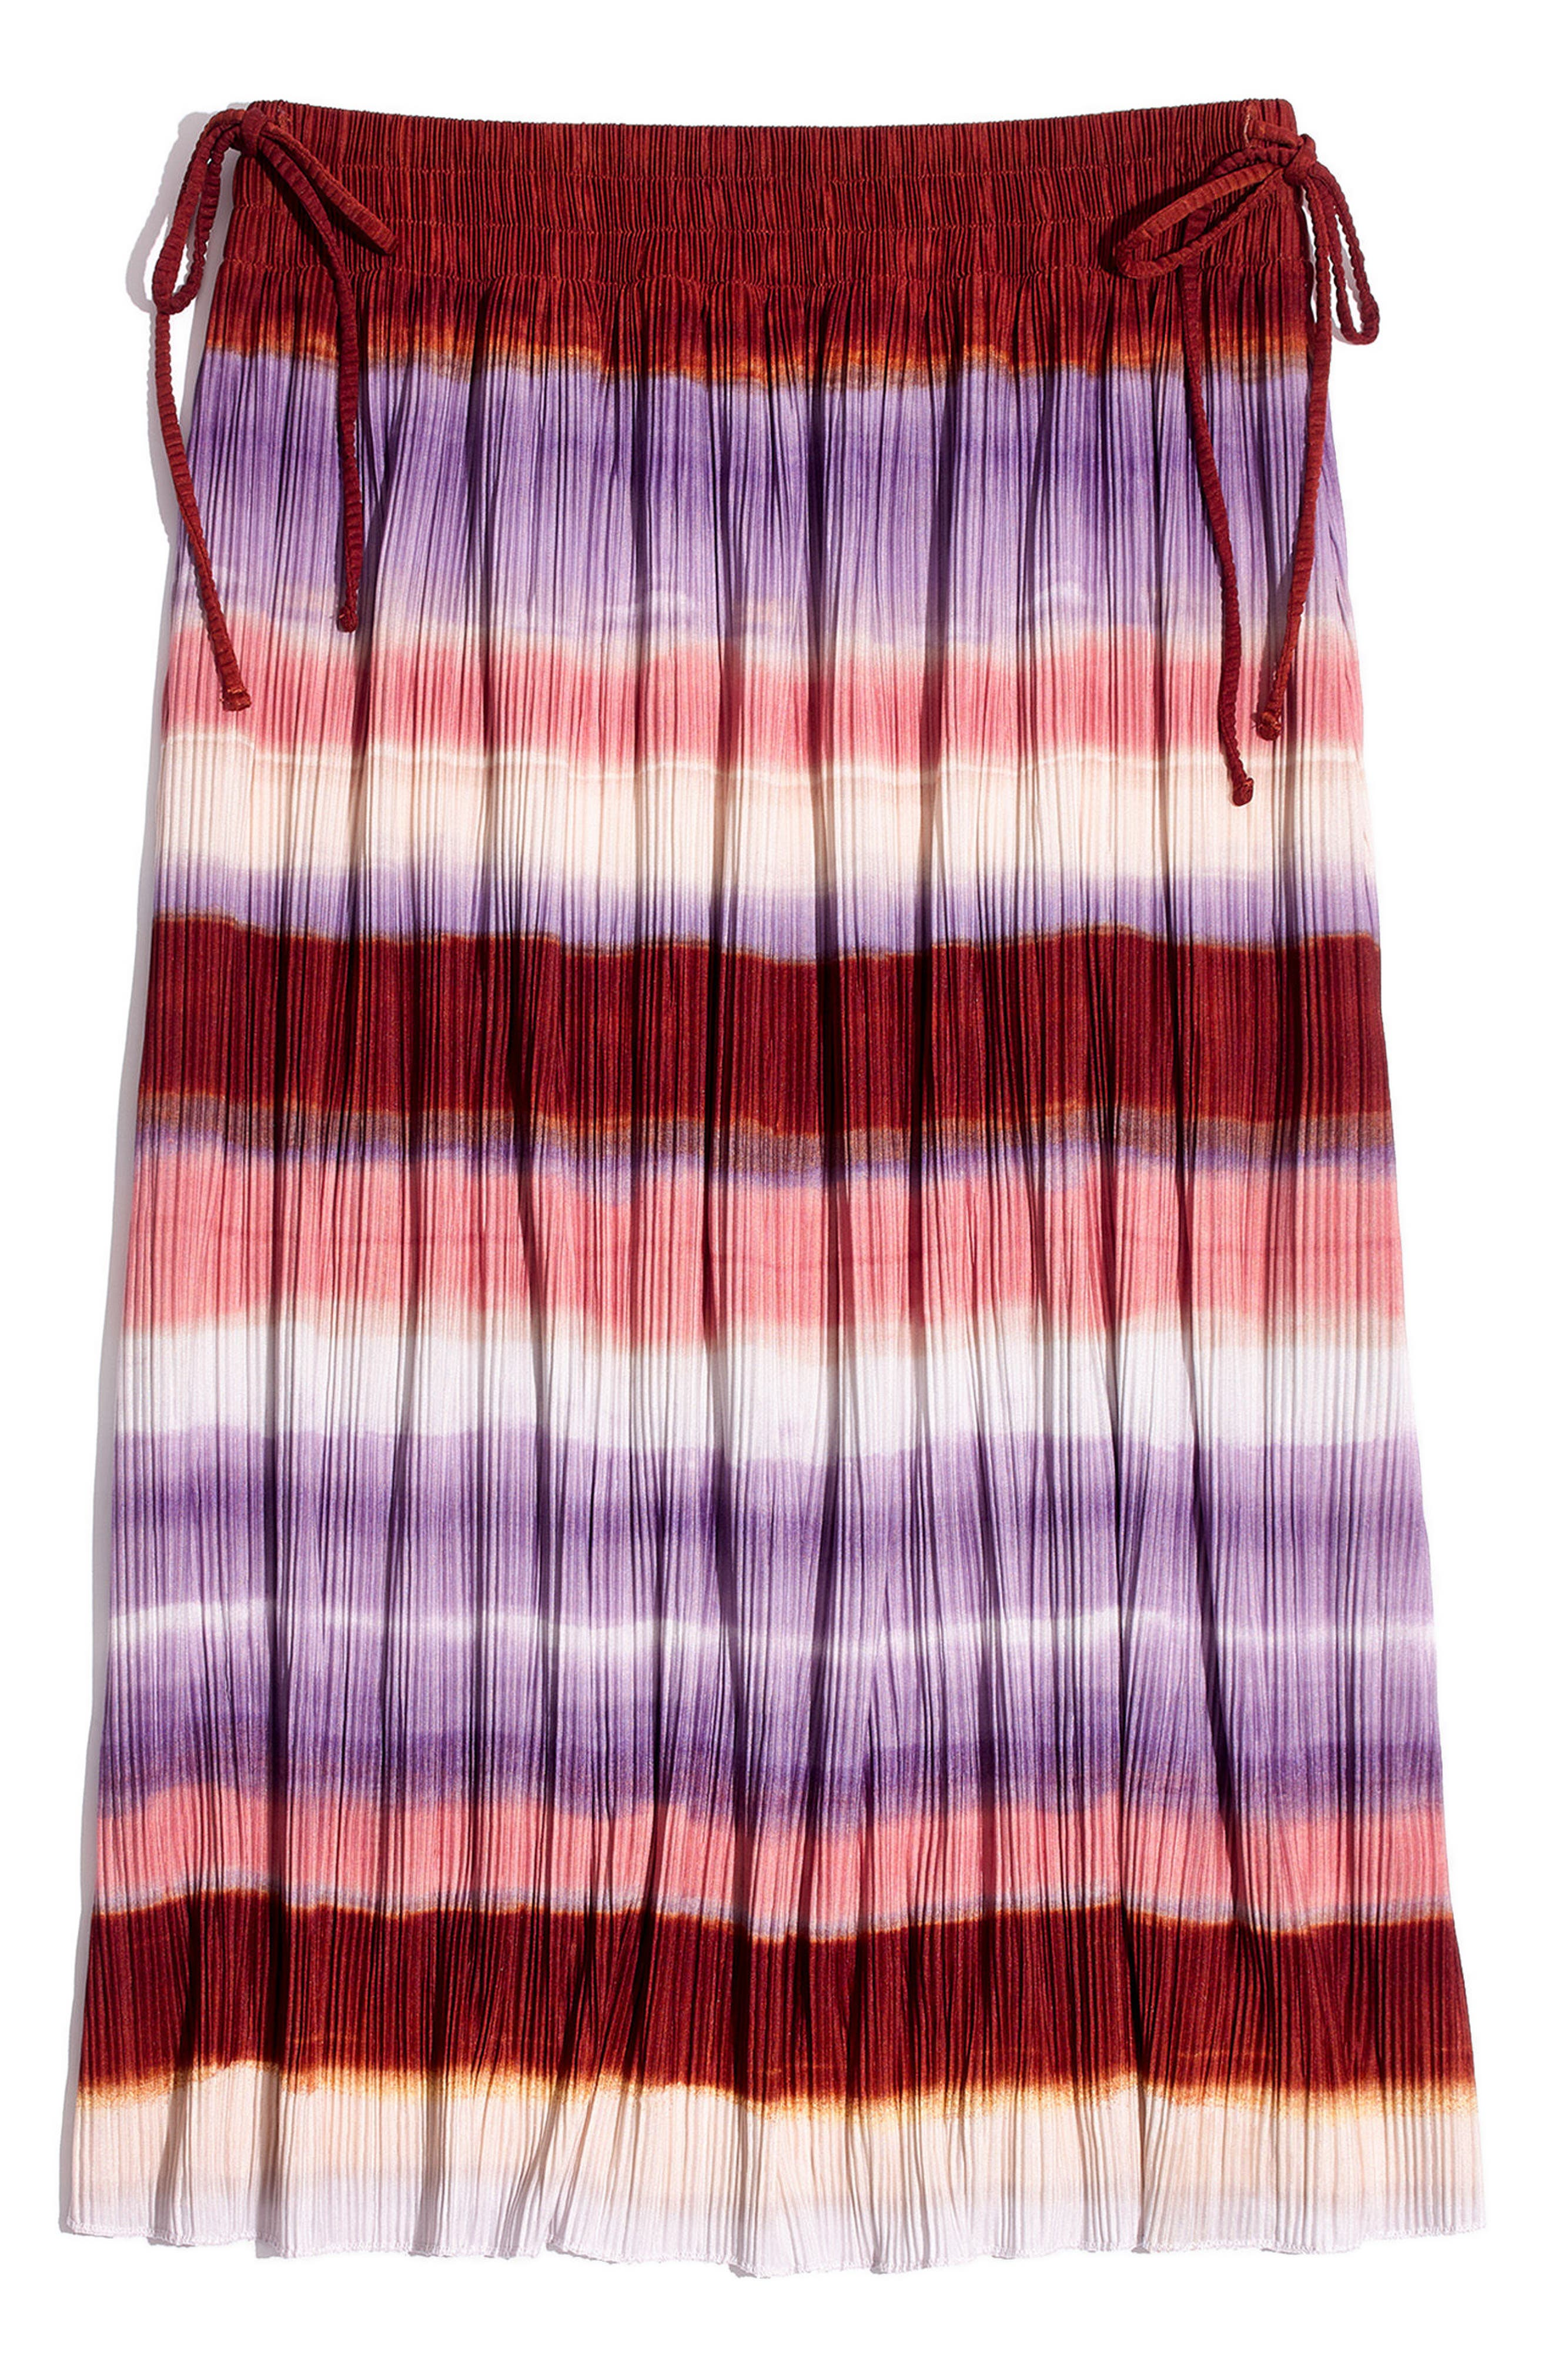 Texture & Thread Ombré Rainbow Micropleat Midi Skirt,                             Alternate thumbnail 4, color,                             Clementine Cream